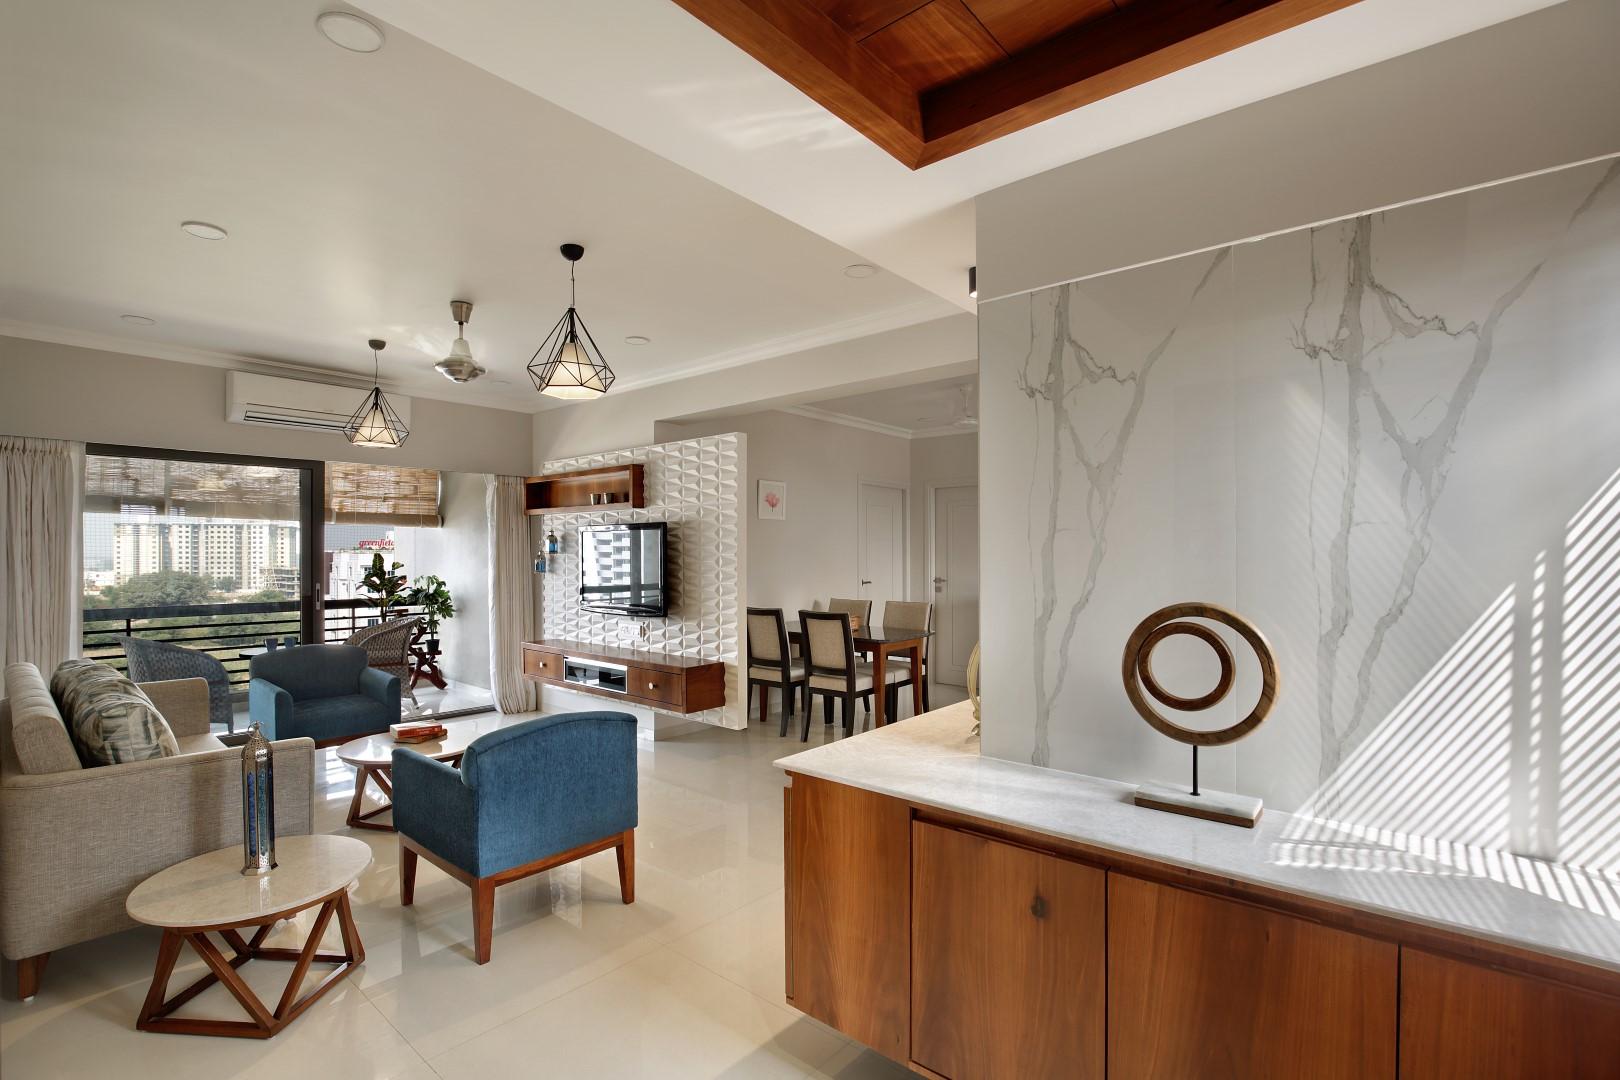 Studio 7 Designs - The Architects